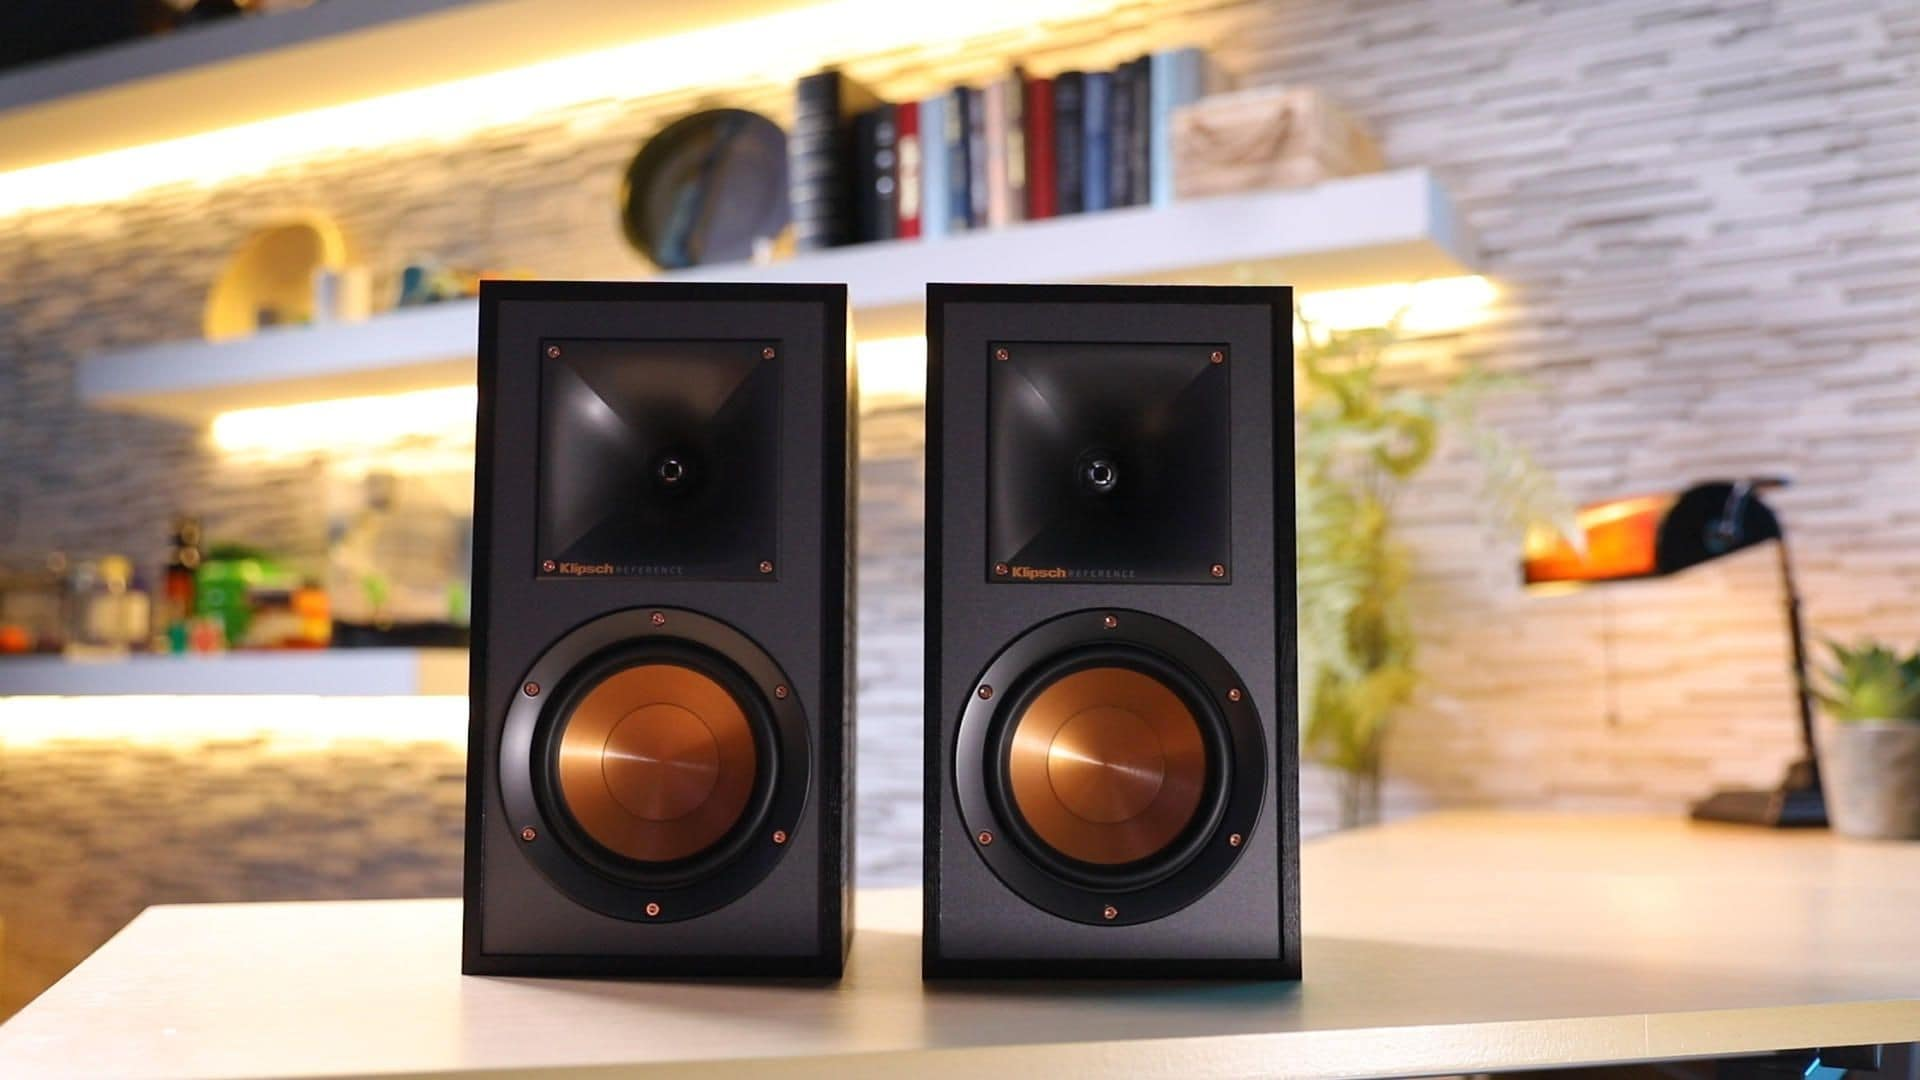 e5d30f39cbbd8 Klipsch s striking R-51M monitors sound great on a budget video - CNET